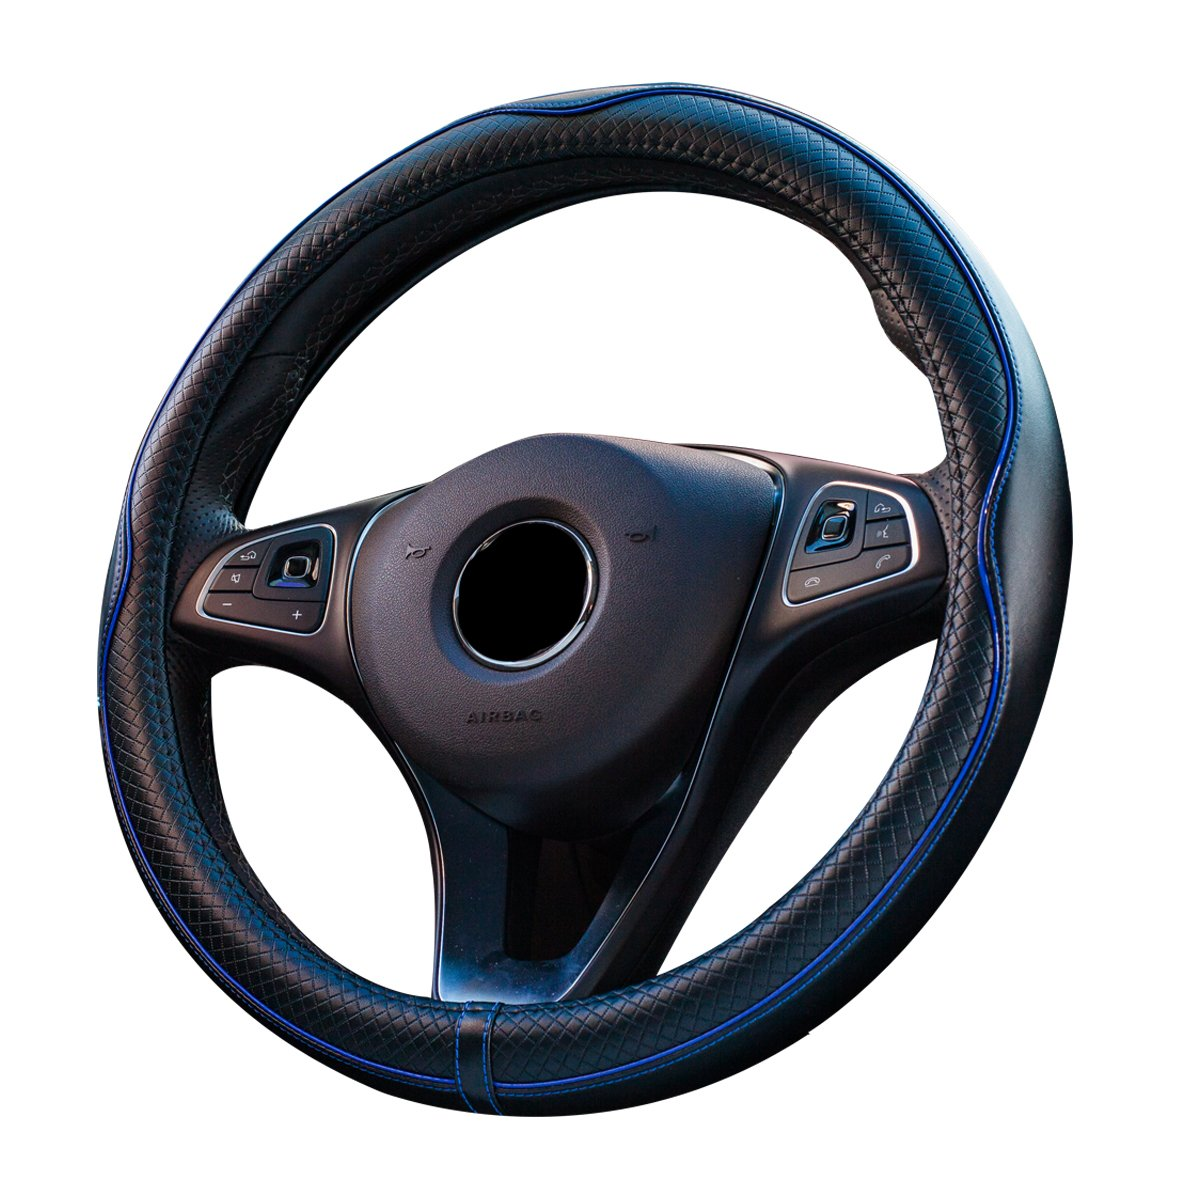 Car Genuine leather Steering Wheel Cover Universal 15 inch/38CM Breathable Anti-slip Auto Wheel Sleeve Protector, Good Grip (Black+Blue) SAND-H